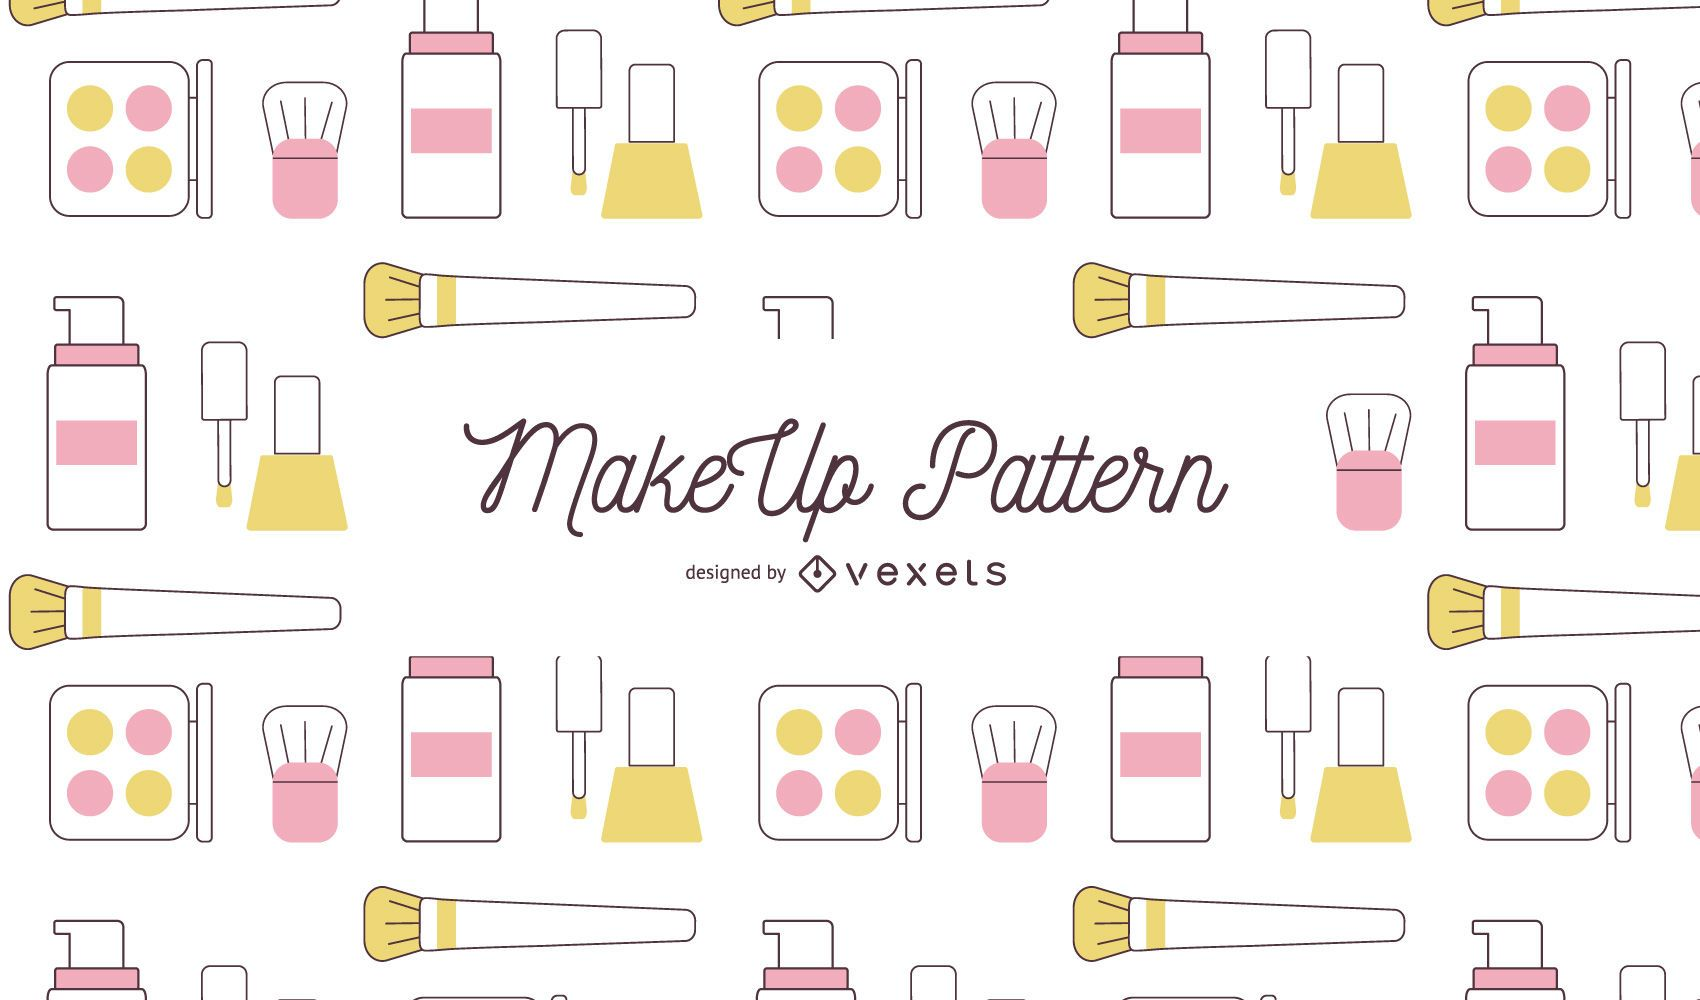 Makeup stroke pattern design